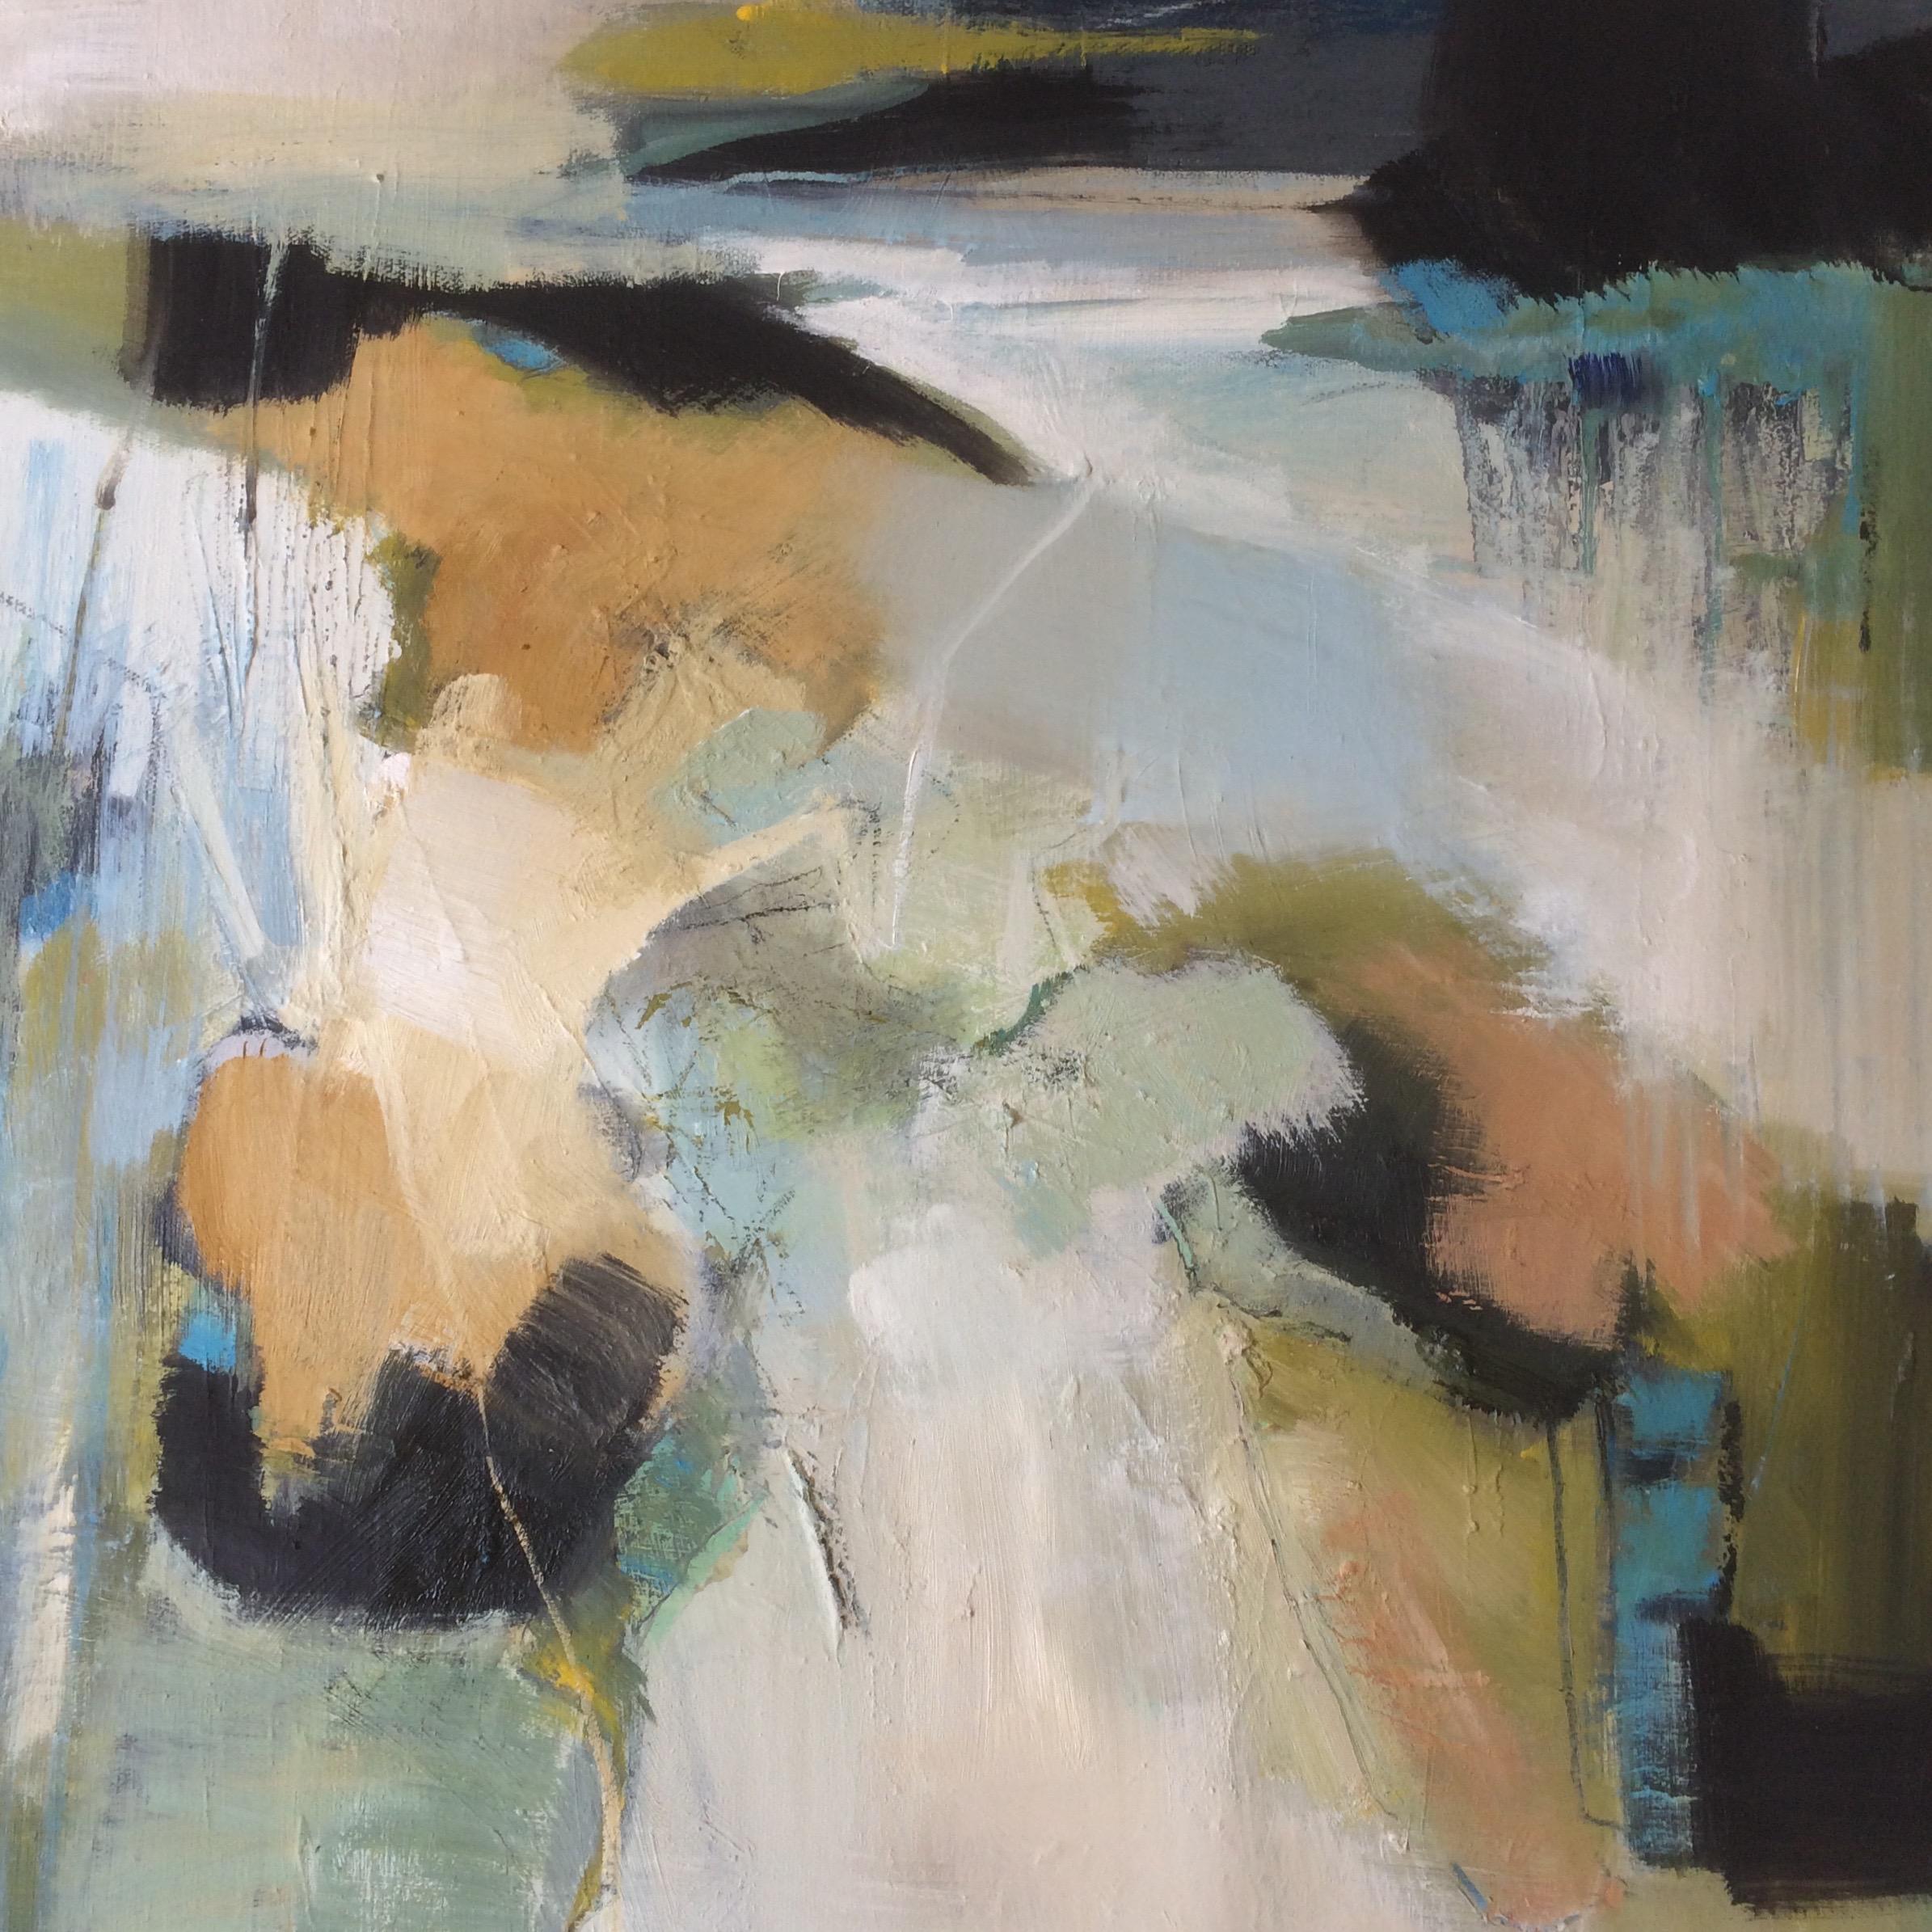 Sandbanks Abstract Oil Painting